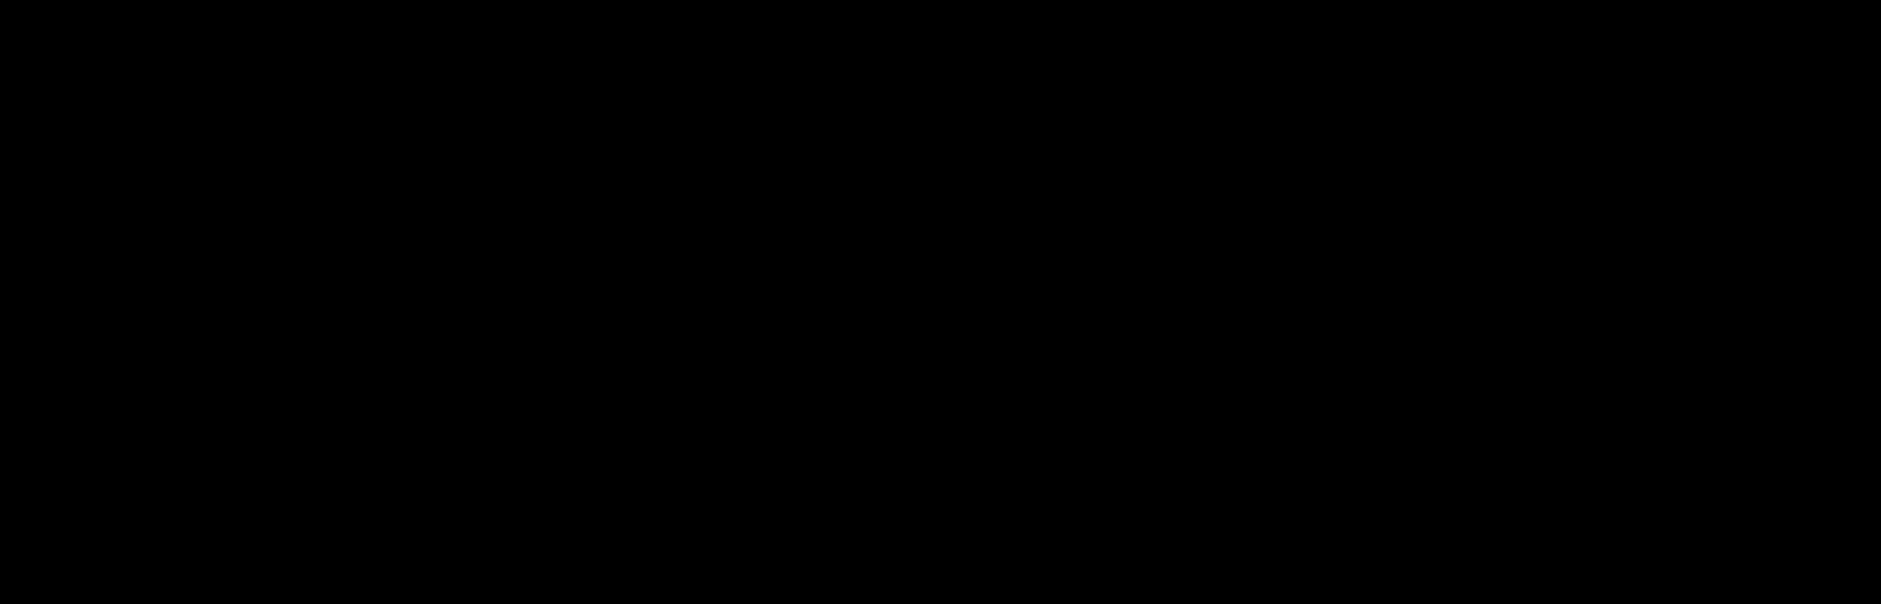 DISQO_Logo_Black_1920x1080-01